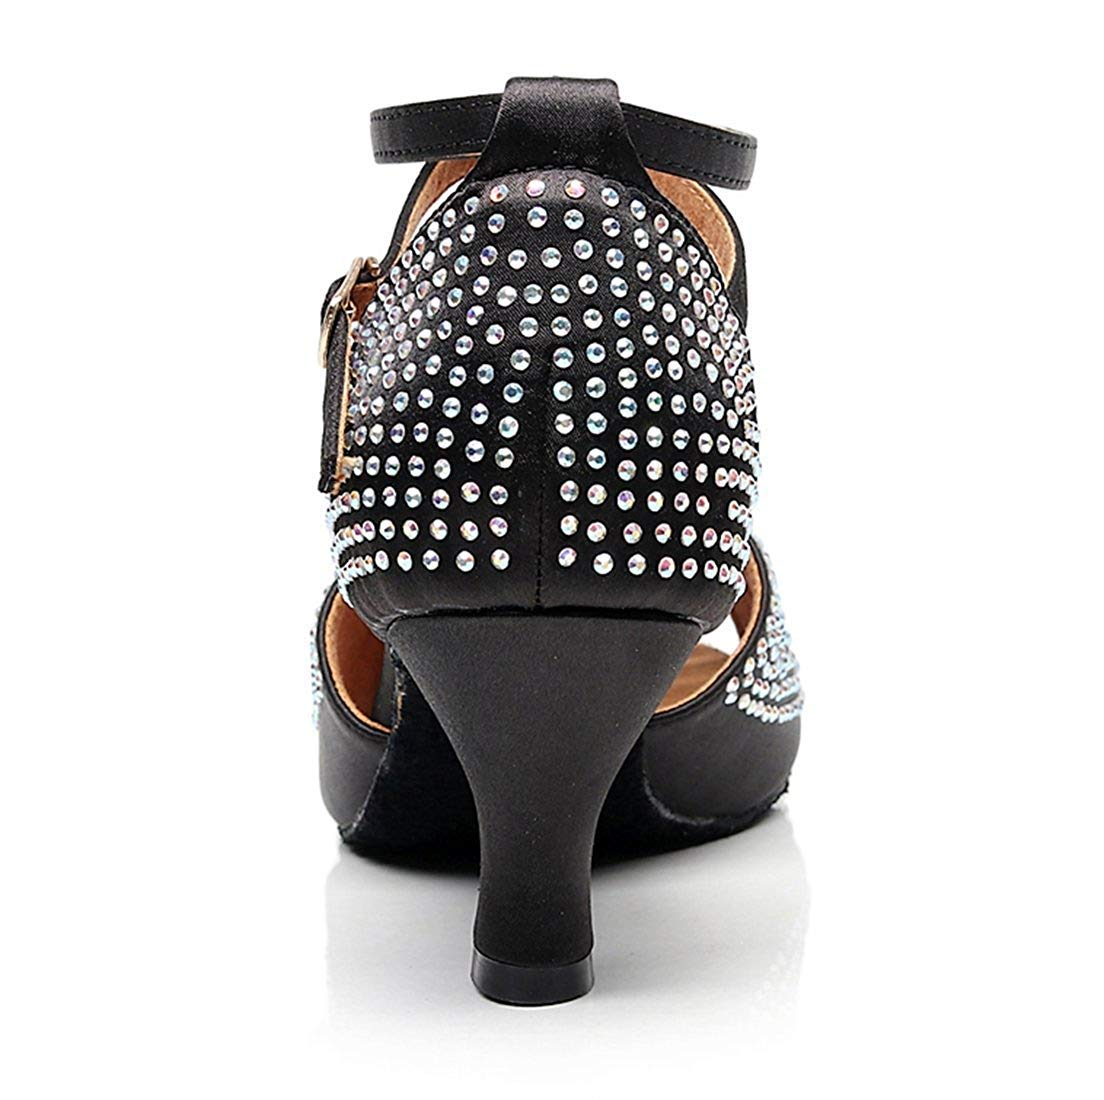 Qiusa Damen Sparkle Crystalds Studded Med Ferse Ferse Ferse Schwarz Tanzschuhe Hochzeit Sandalen UK 2 (Farbe   - Größe   -) 239a80